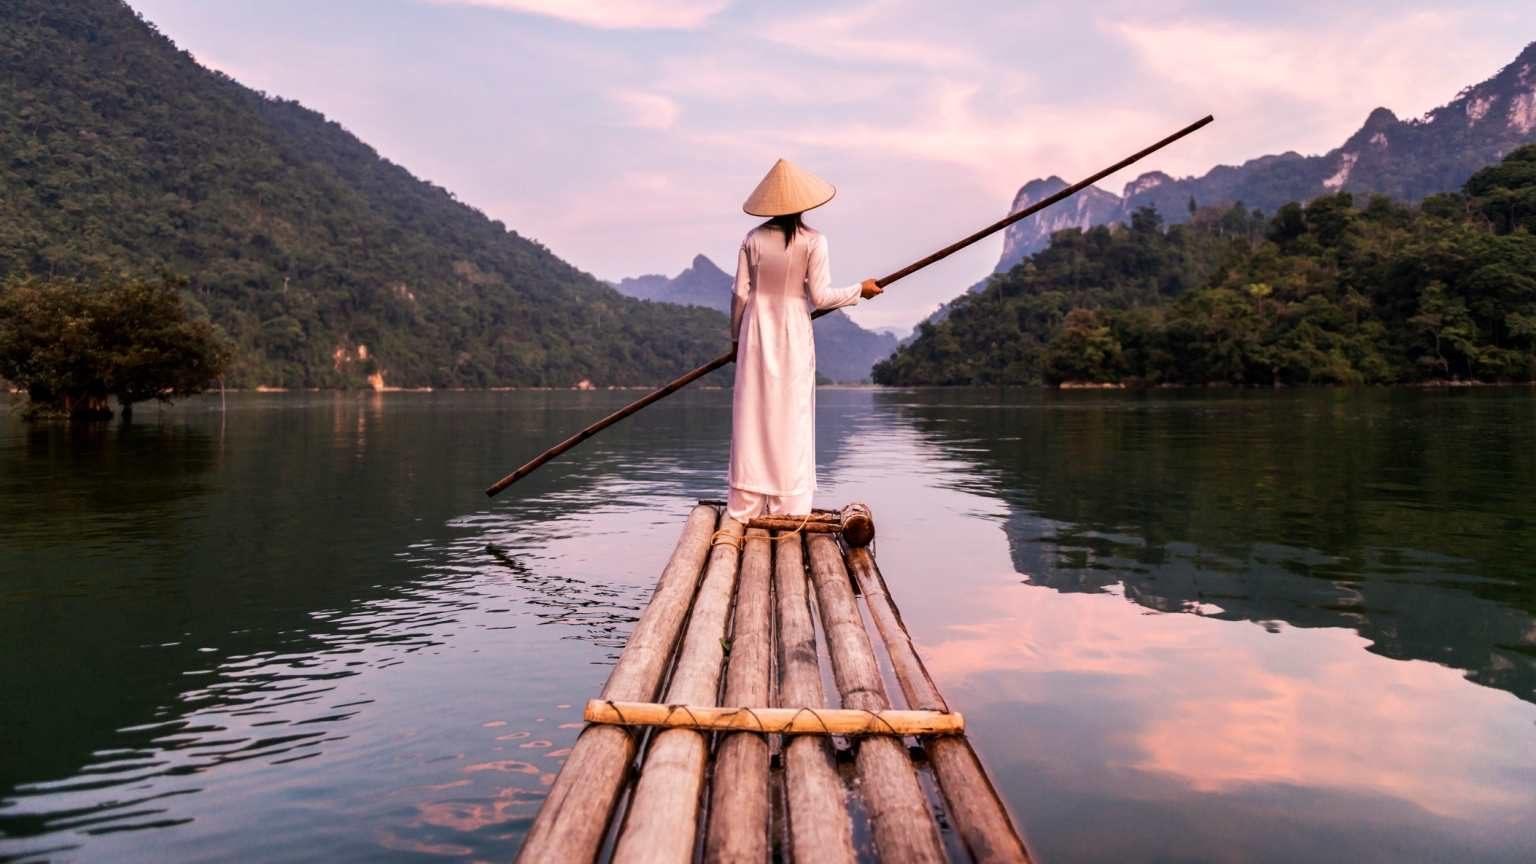 Asia, Vietnam, Hanoi, Vietnamese woman wearing traditional clothing, punting a bamboo raft across lake, at sunset